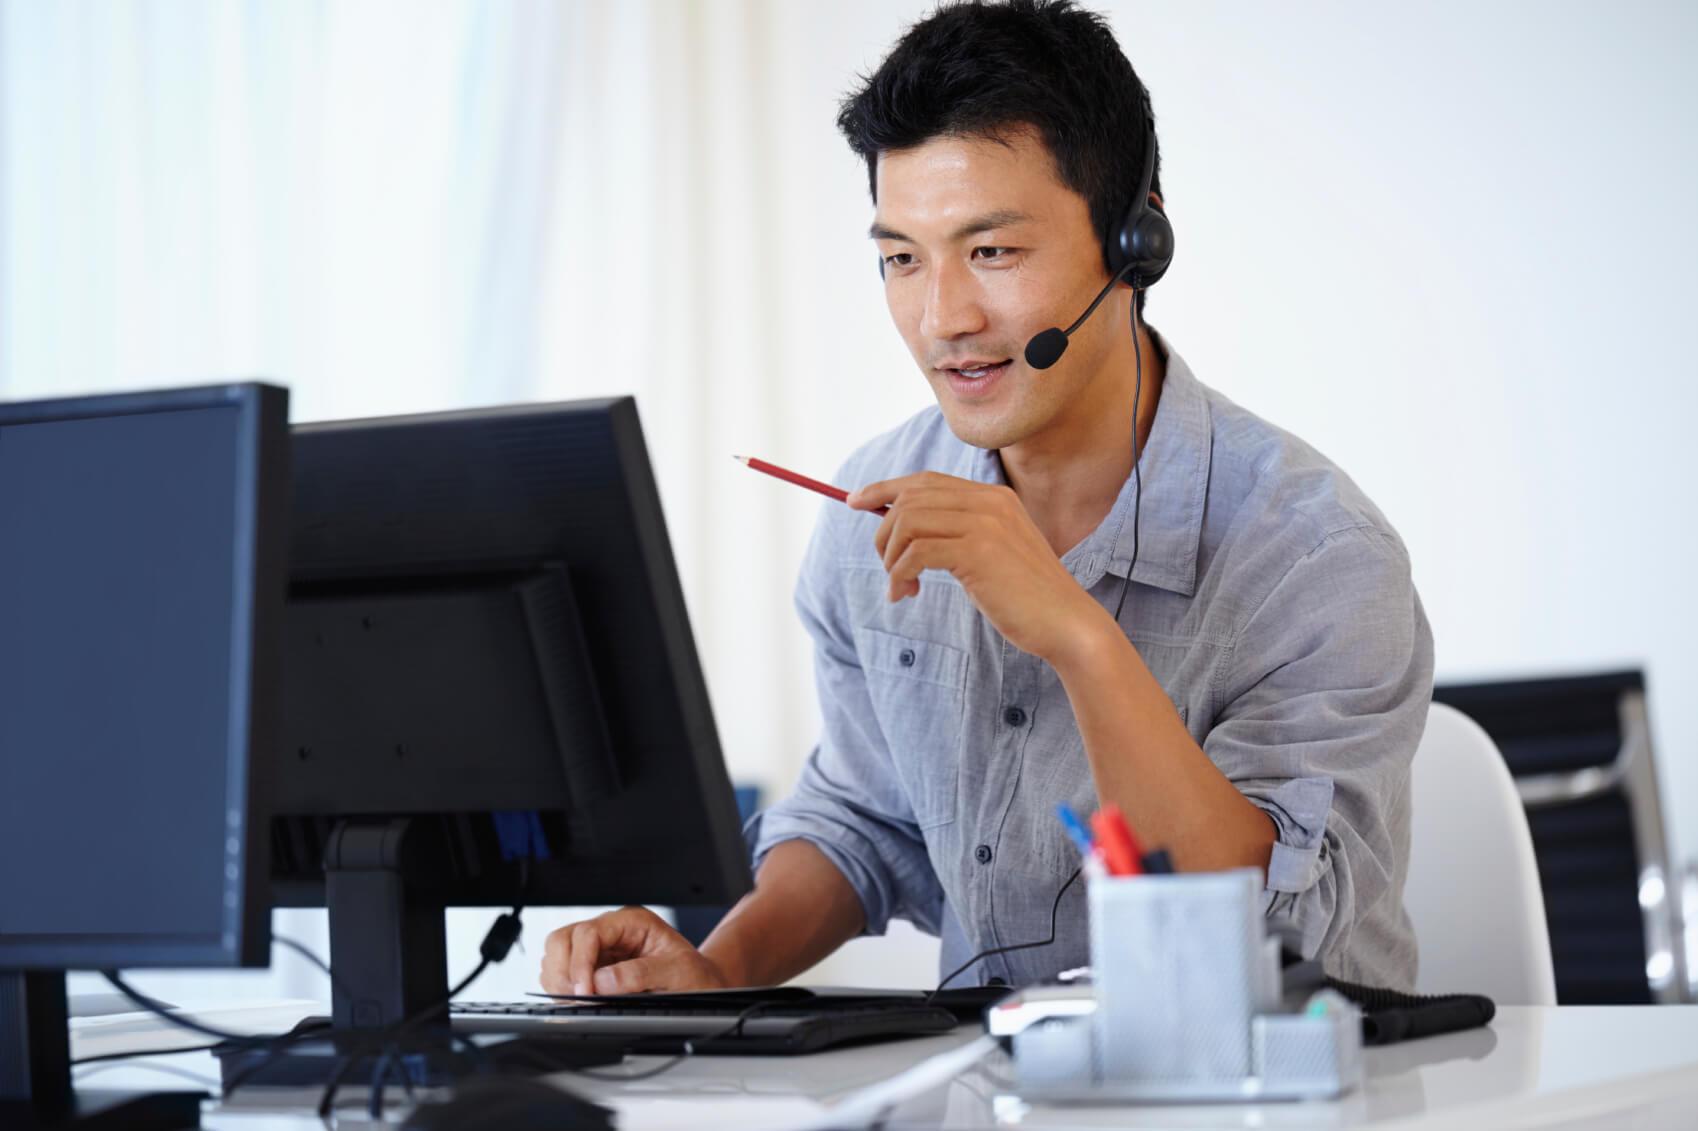 IT professional at help desk